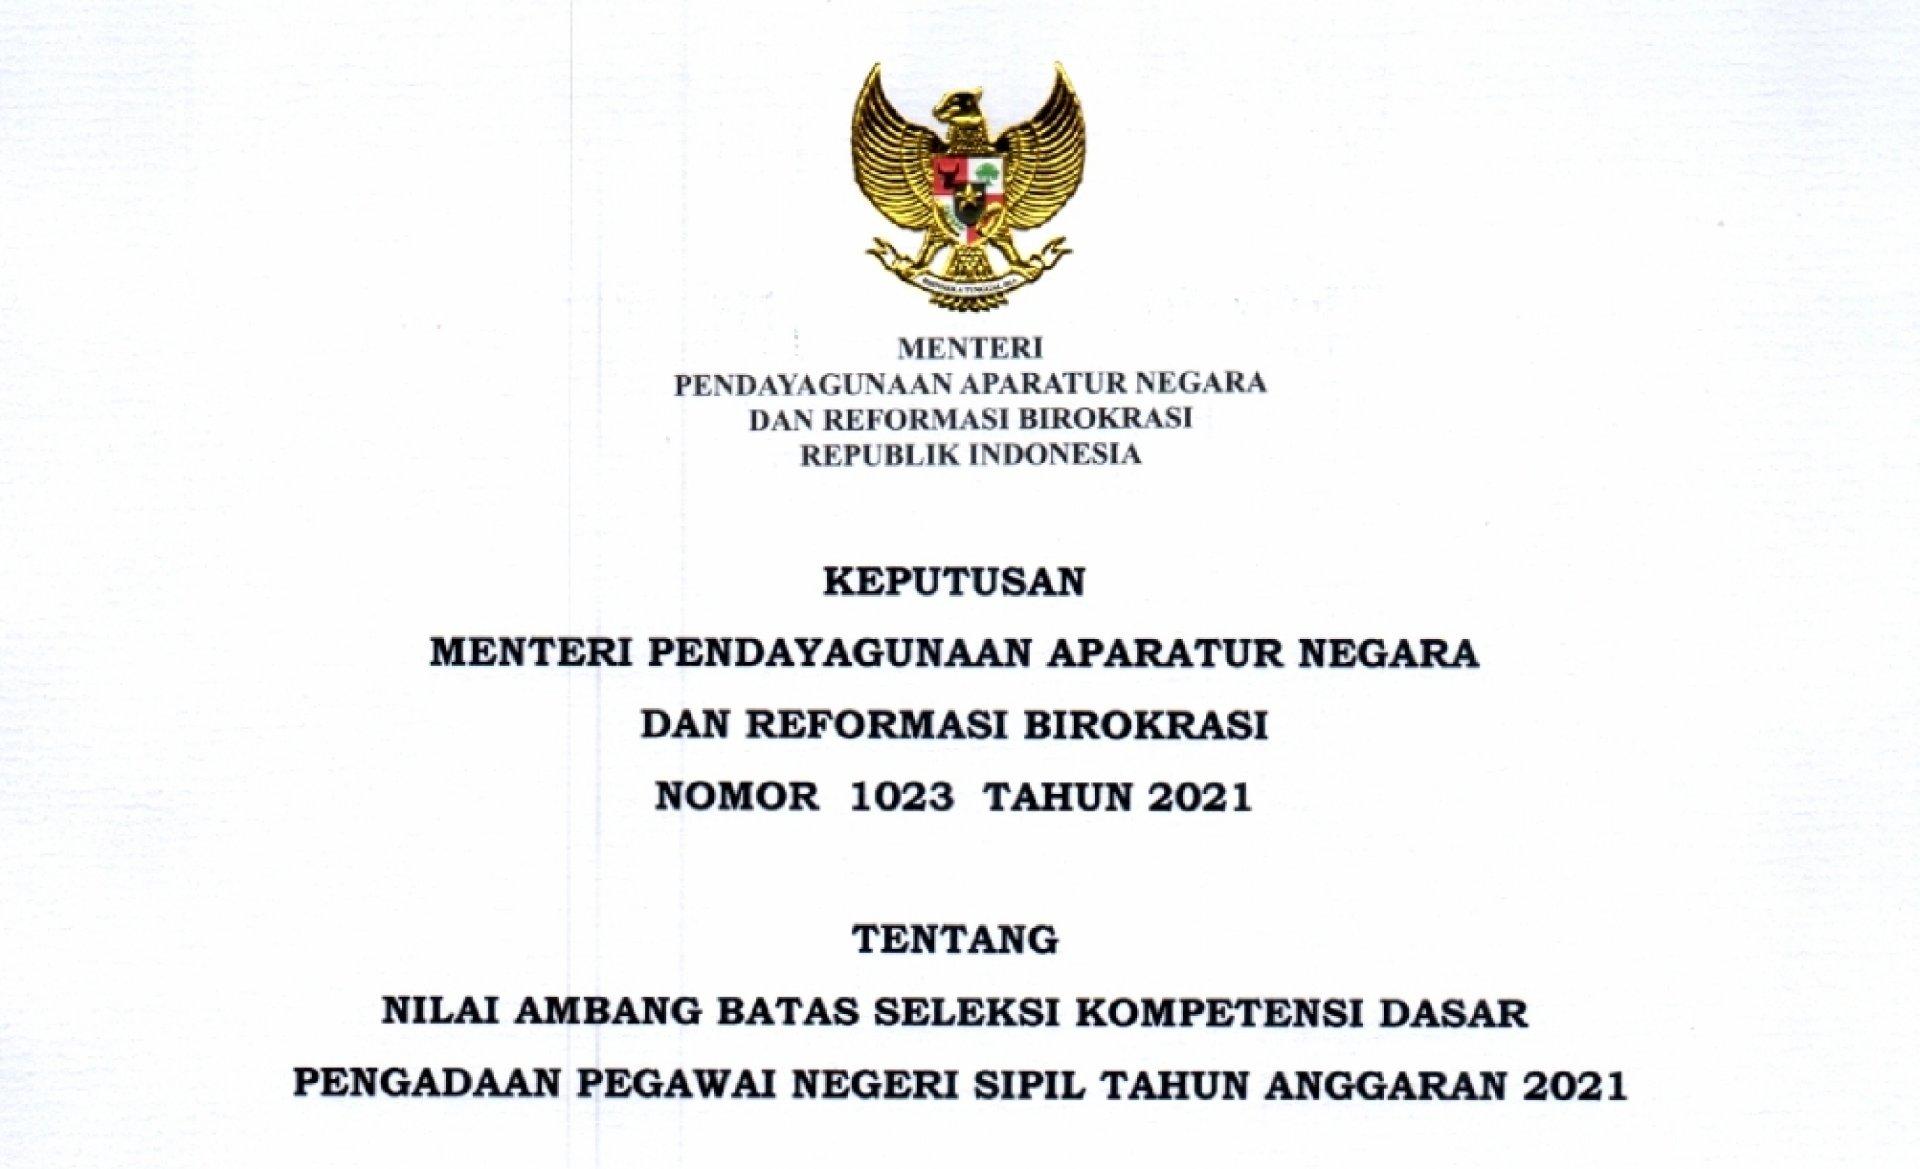 Keputusan Menpan RB Nomor 1023 Tentang Nilai Ambang Batas Seleksi Kompetensi Dasar CPNS Tahun 2021